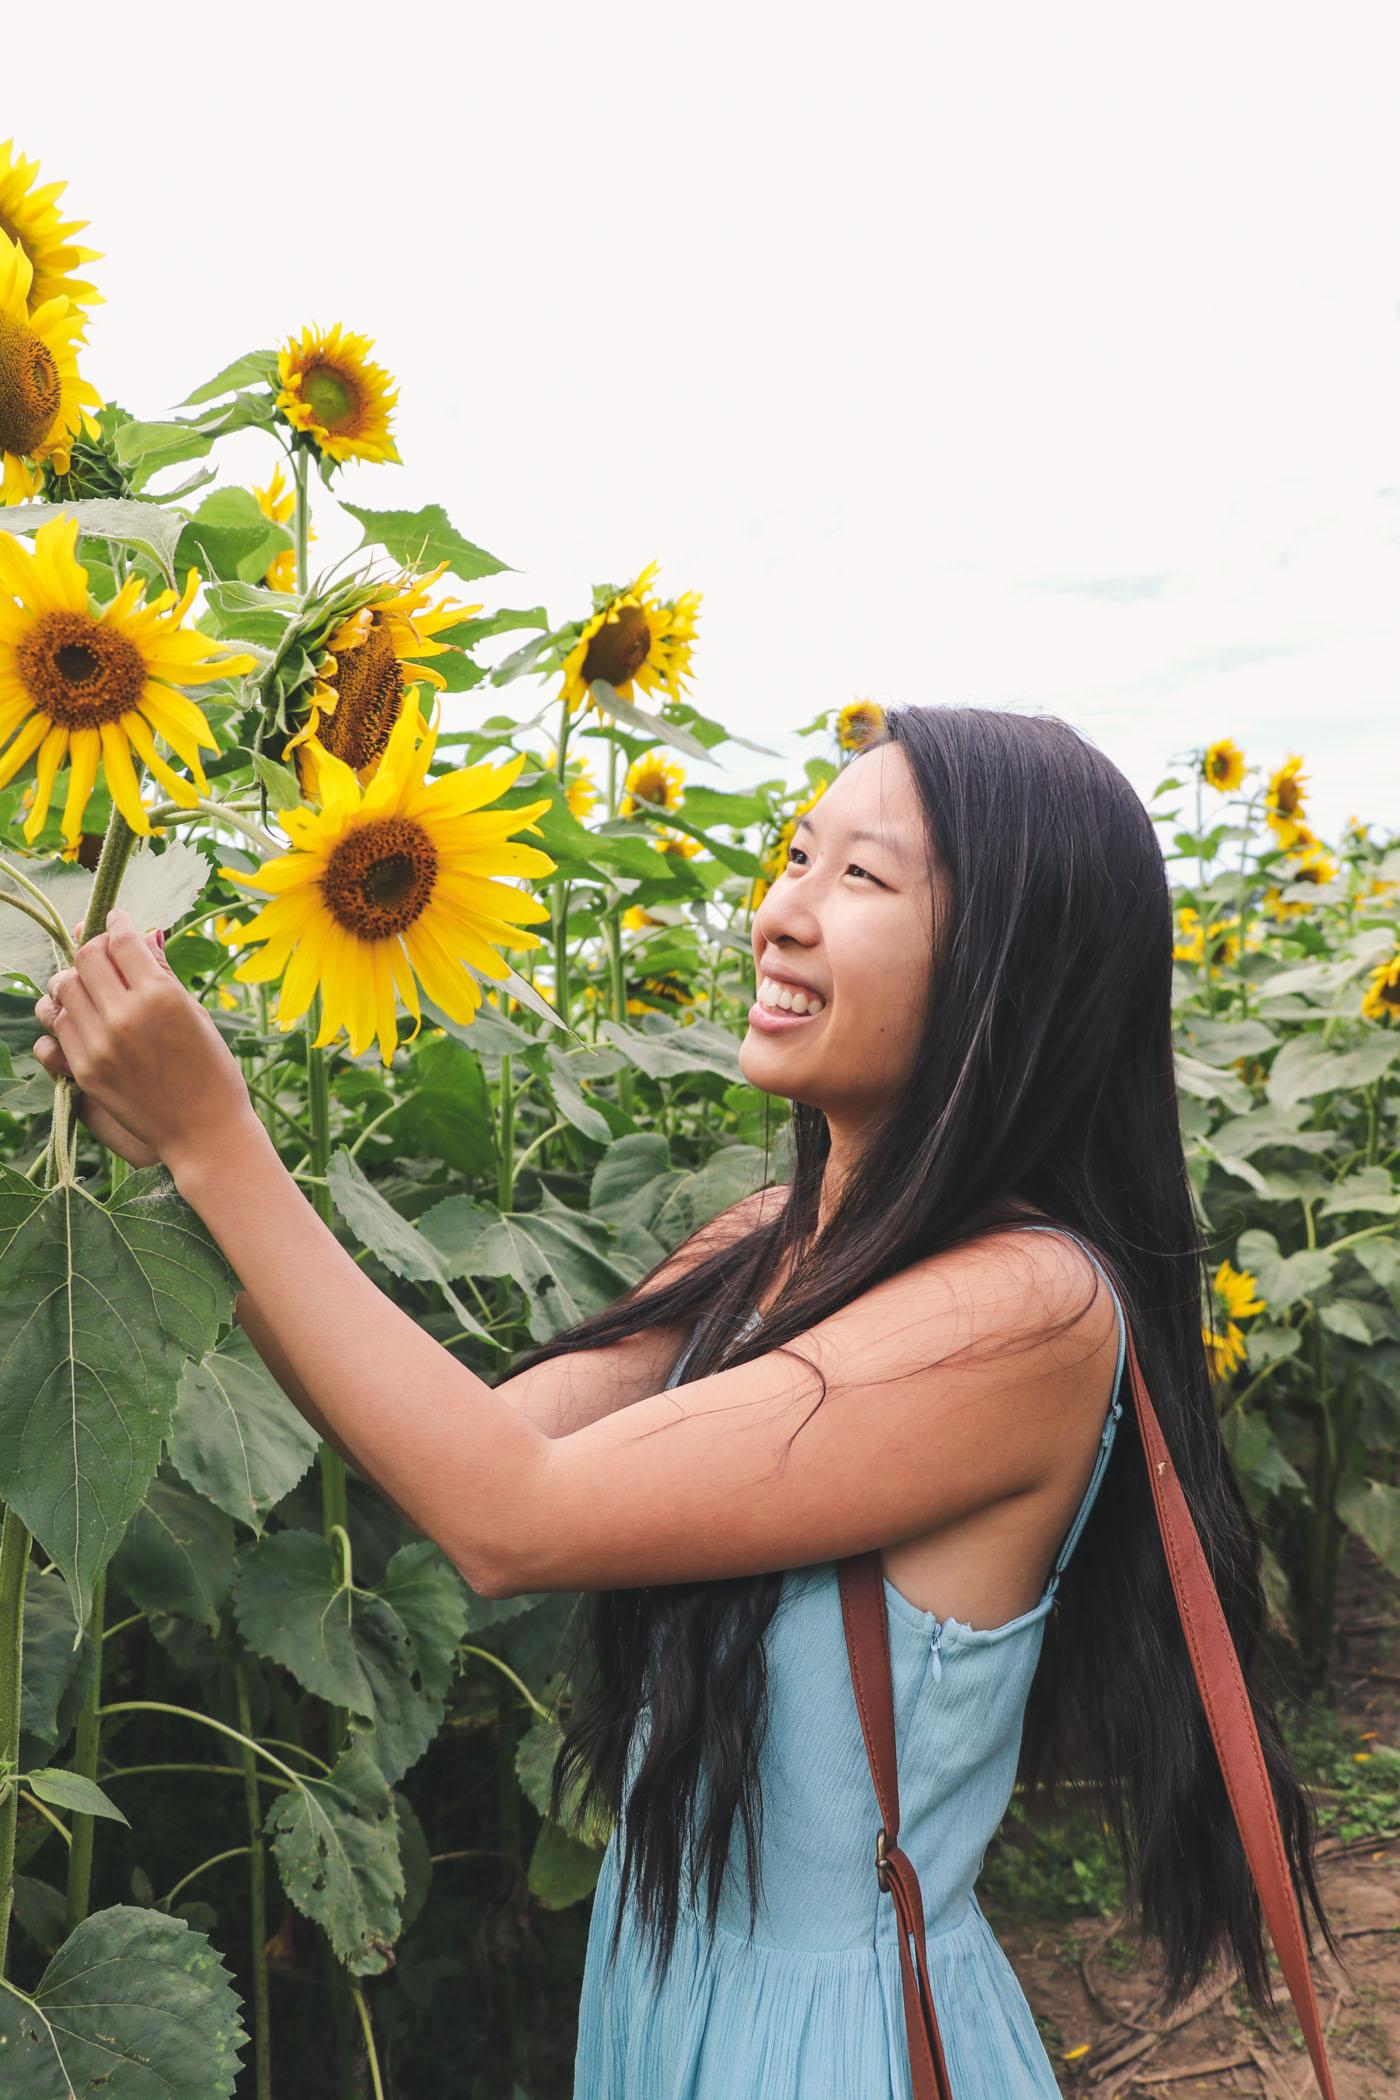 Buttonwood Farms Sunflower Festival, Griswold, Connecticut